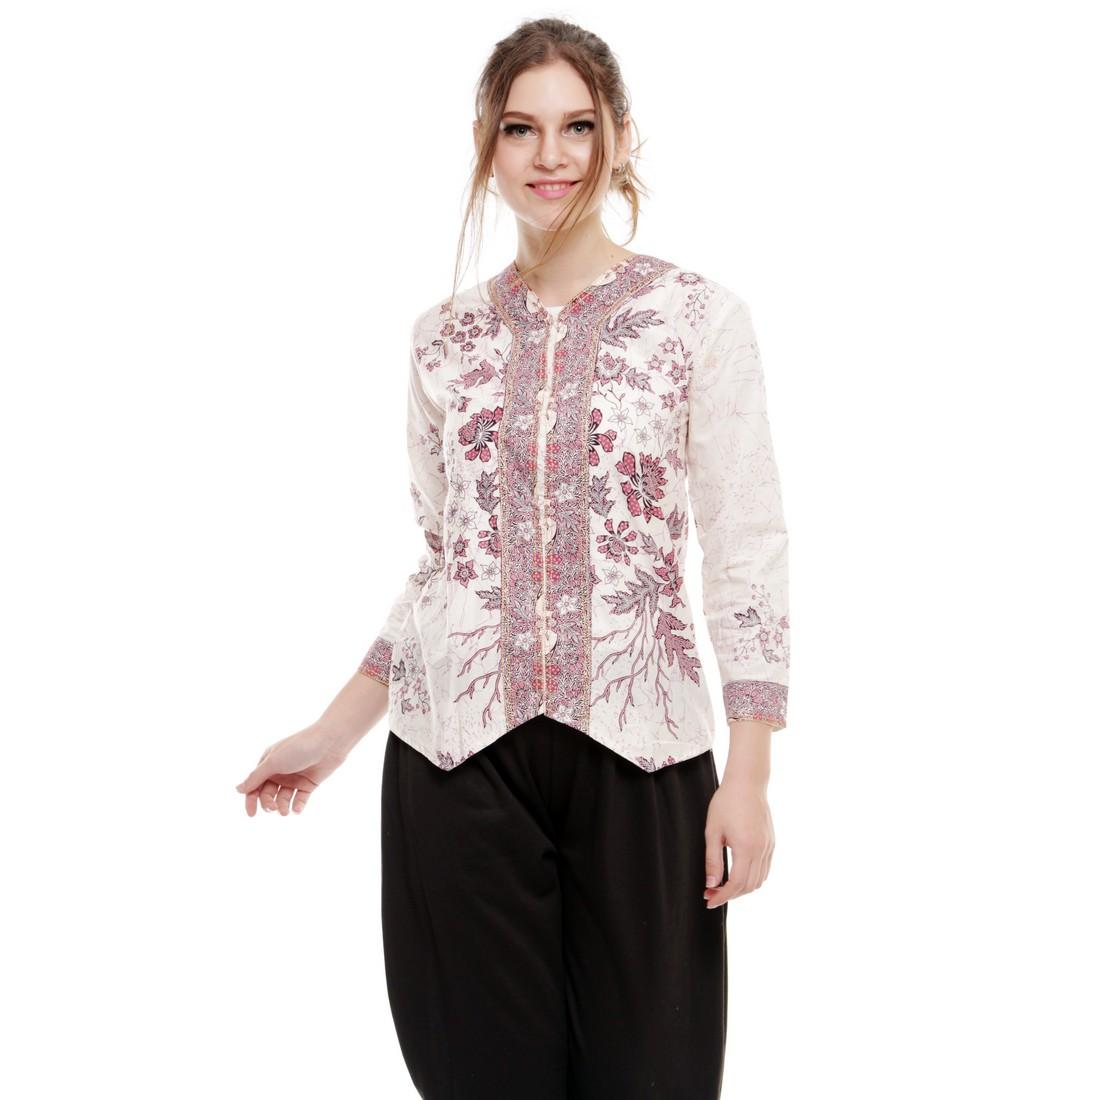 Blouse Batik Bali Klasik